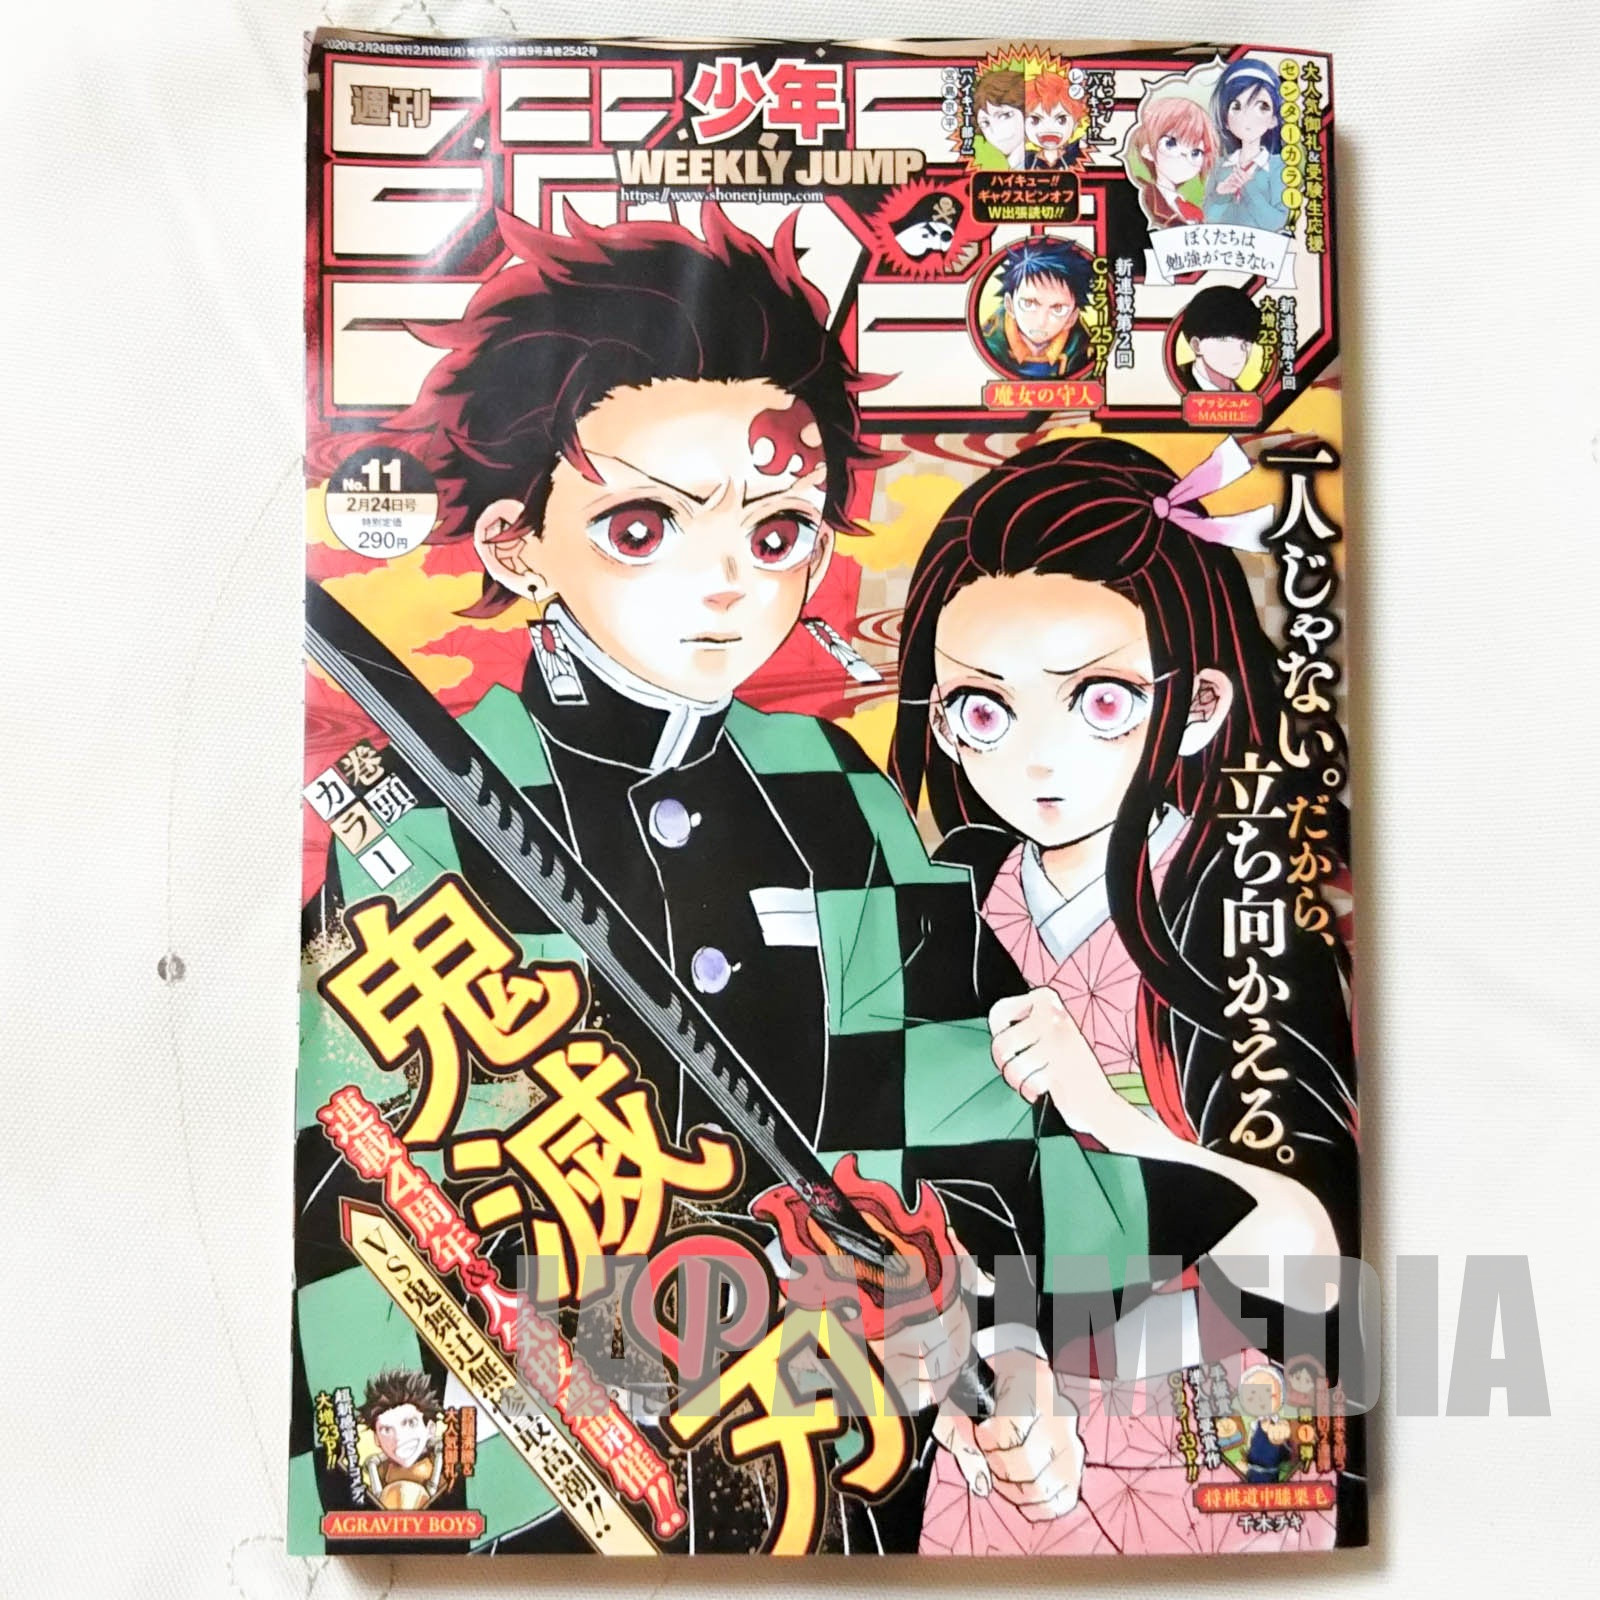 Weekly Shonen JUMP Vol.11 2020 Demon Slayer: Kimetsu no Yaiba / Japanese Magazine JAPAN MANGA